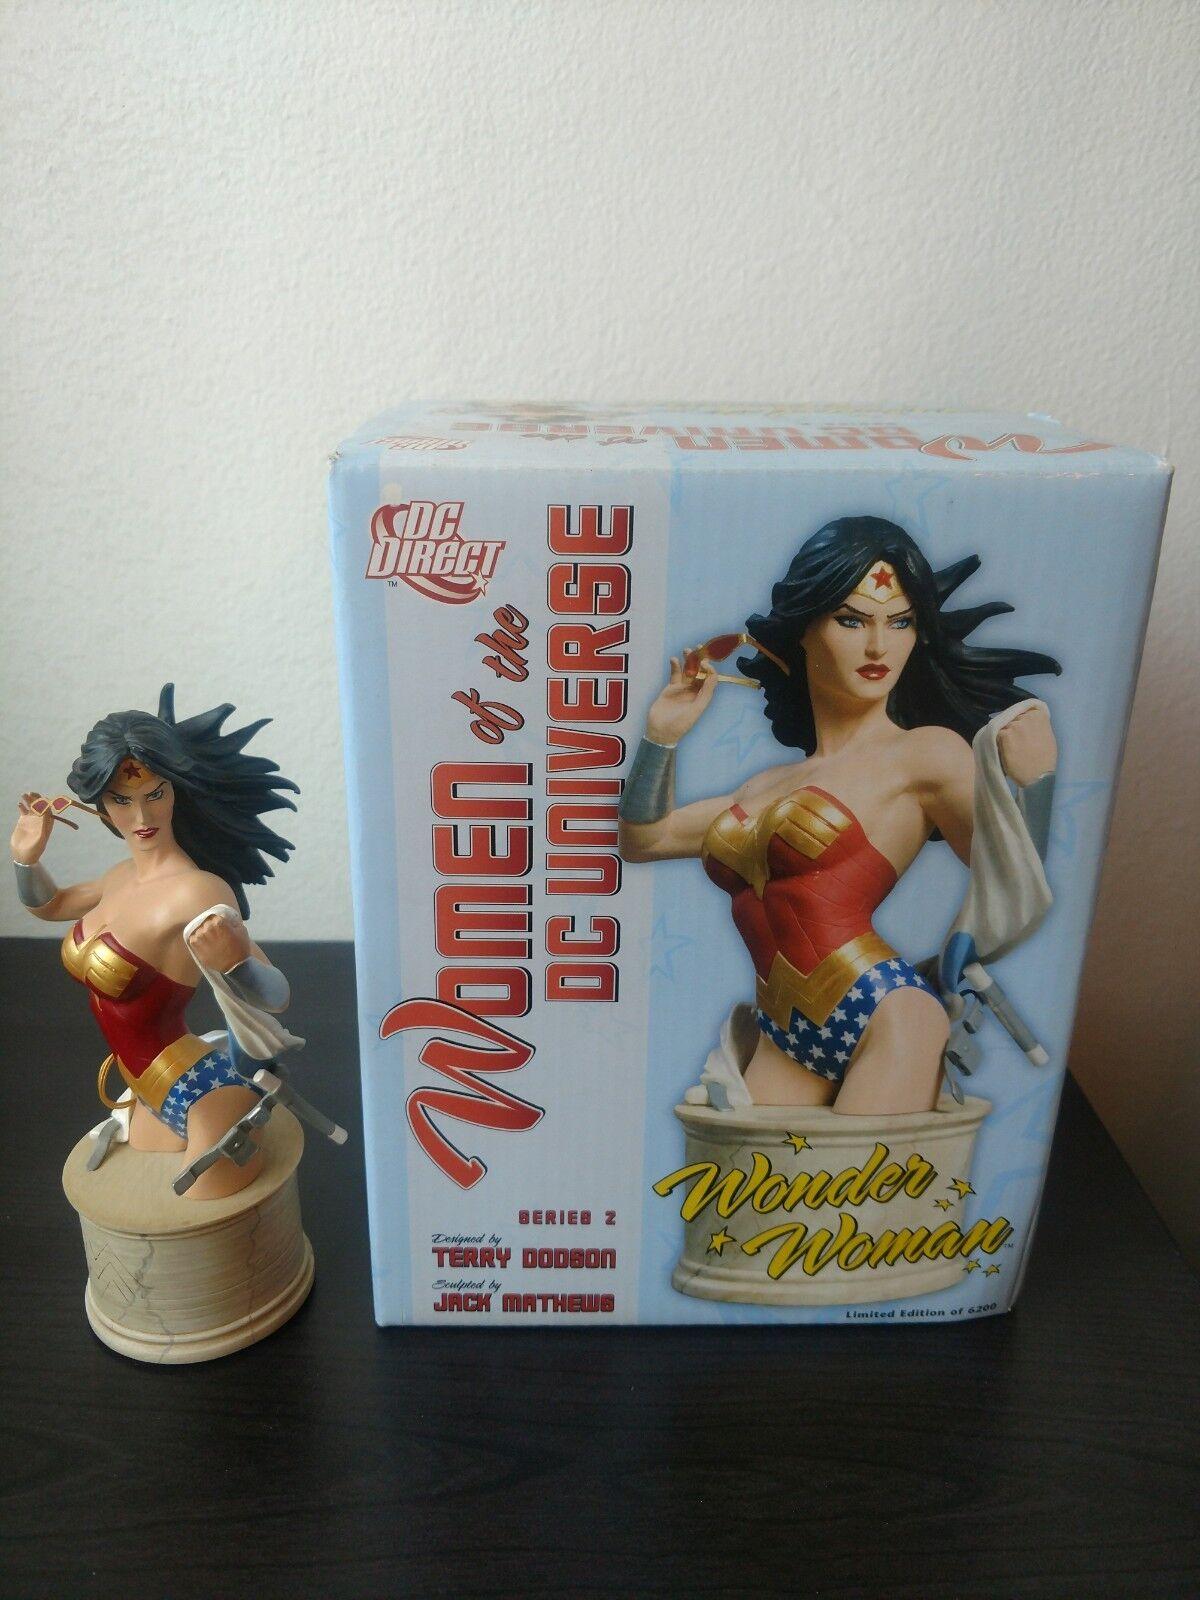 NIB Wonder Woman Bust 4925 6200 damen of the DC Universe Series 2 Terry Dodson